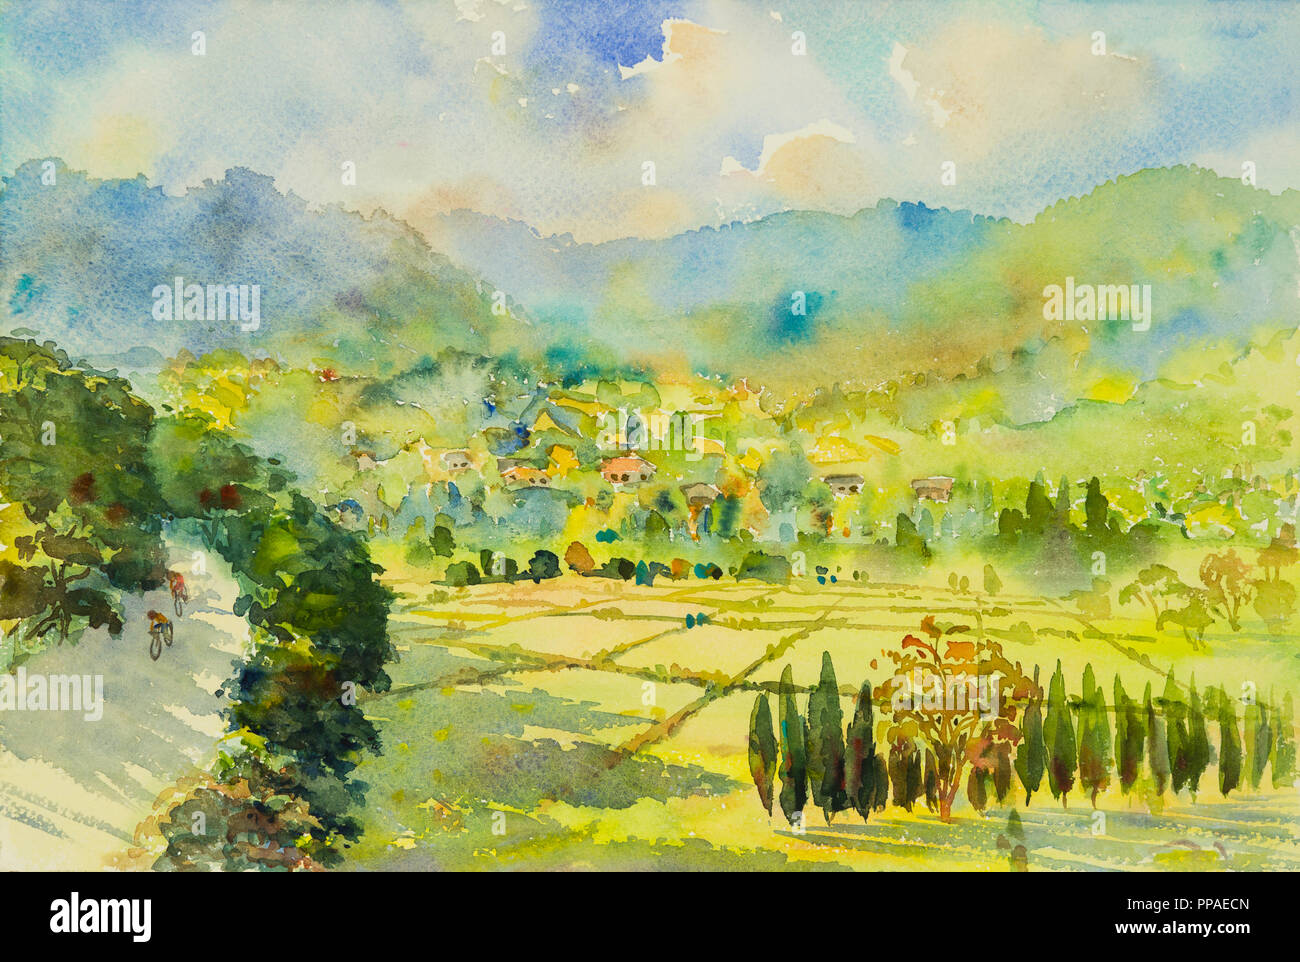 Mountain Landscape Painted Watercolor Immagini Mountain